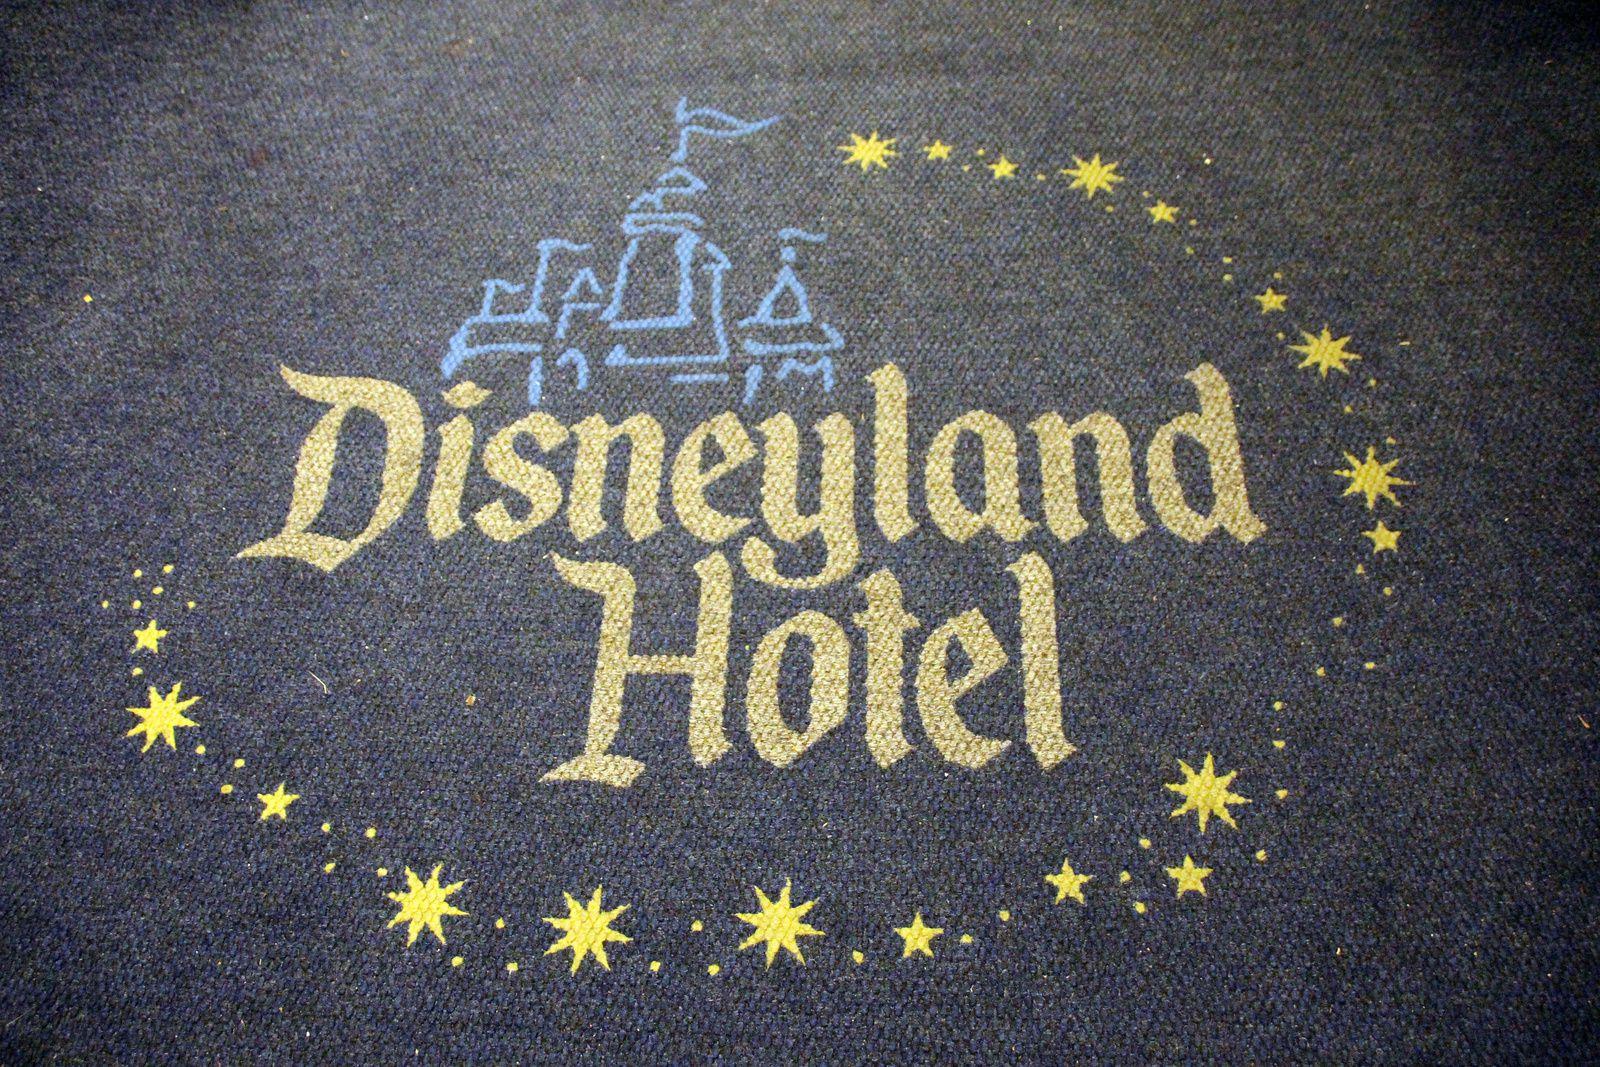 Disneyland Hotel, Disneyland Resort (Californie)